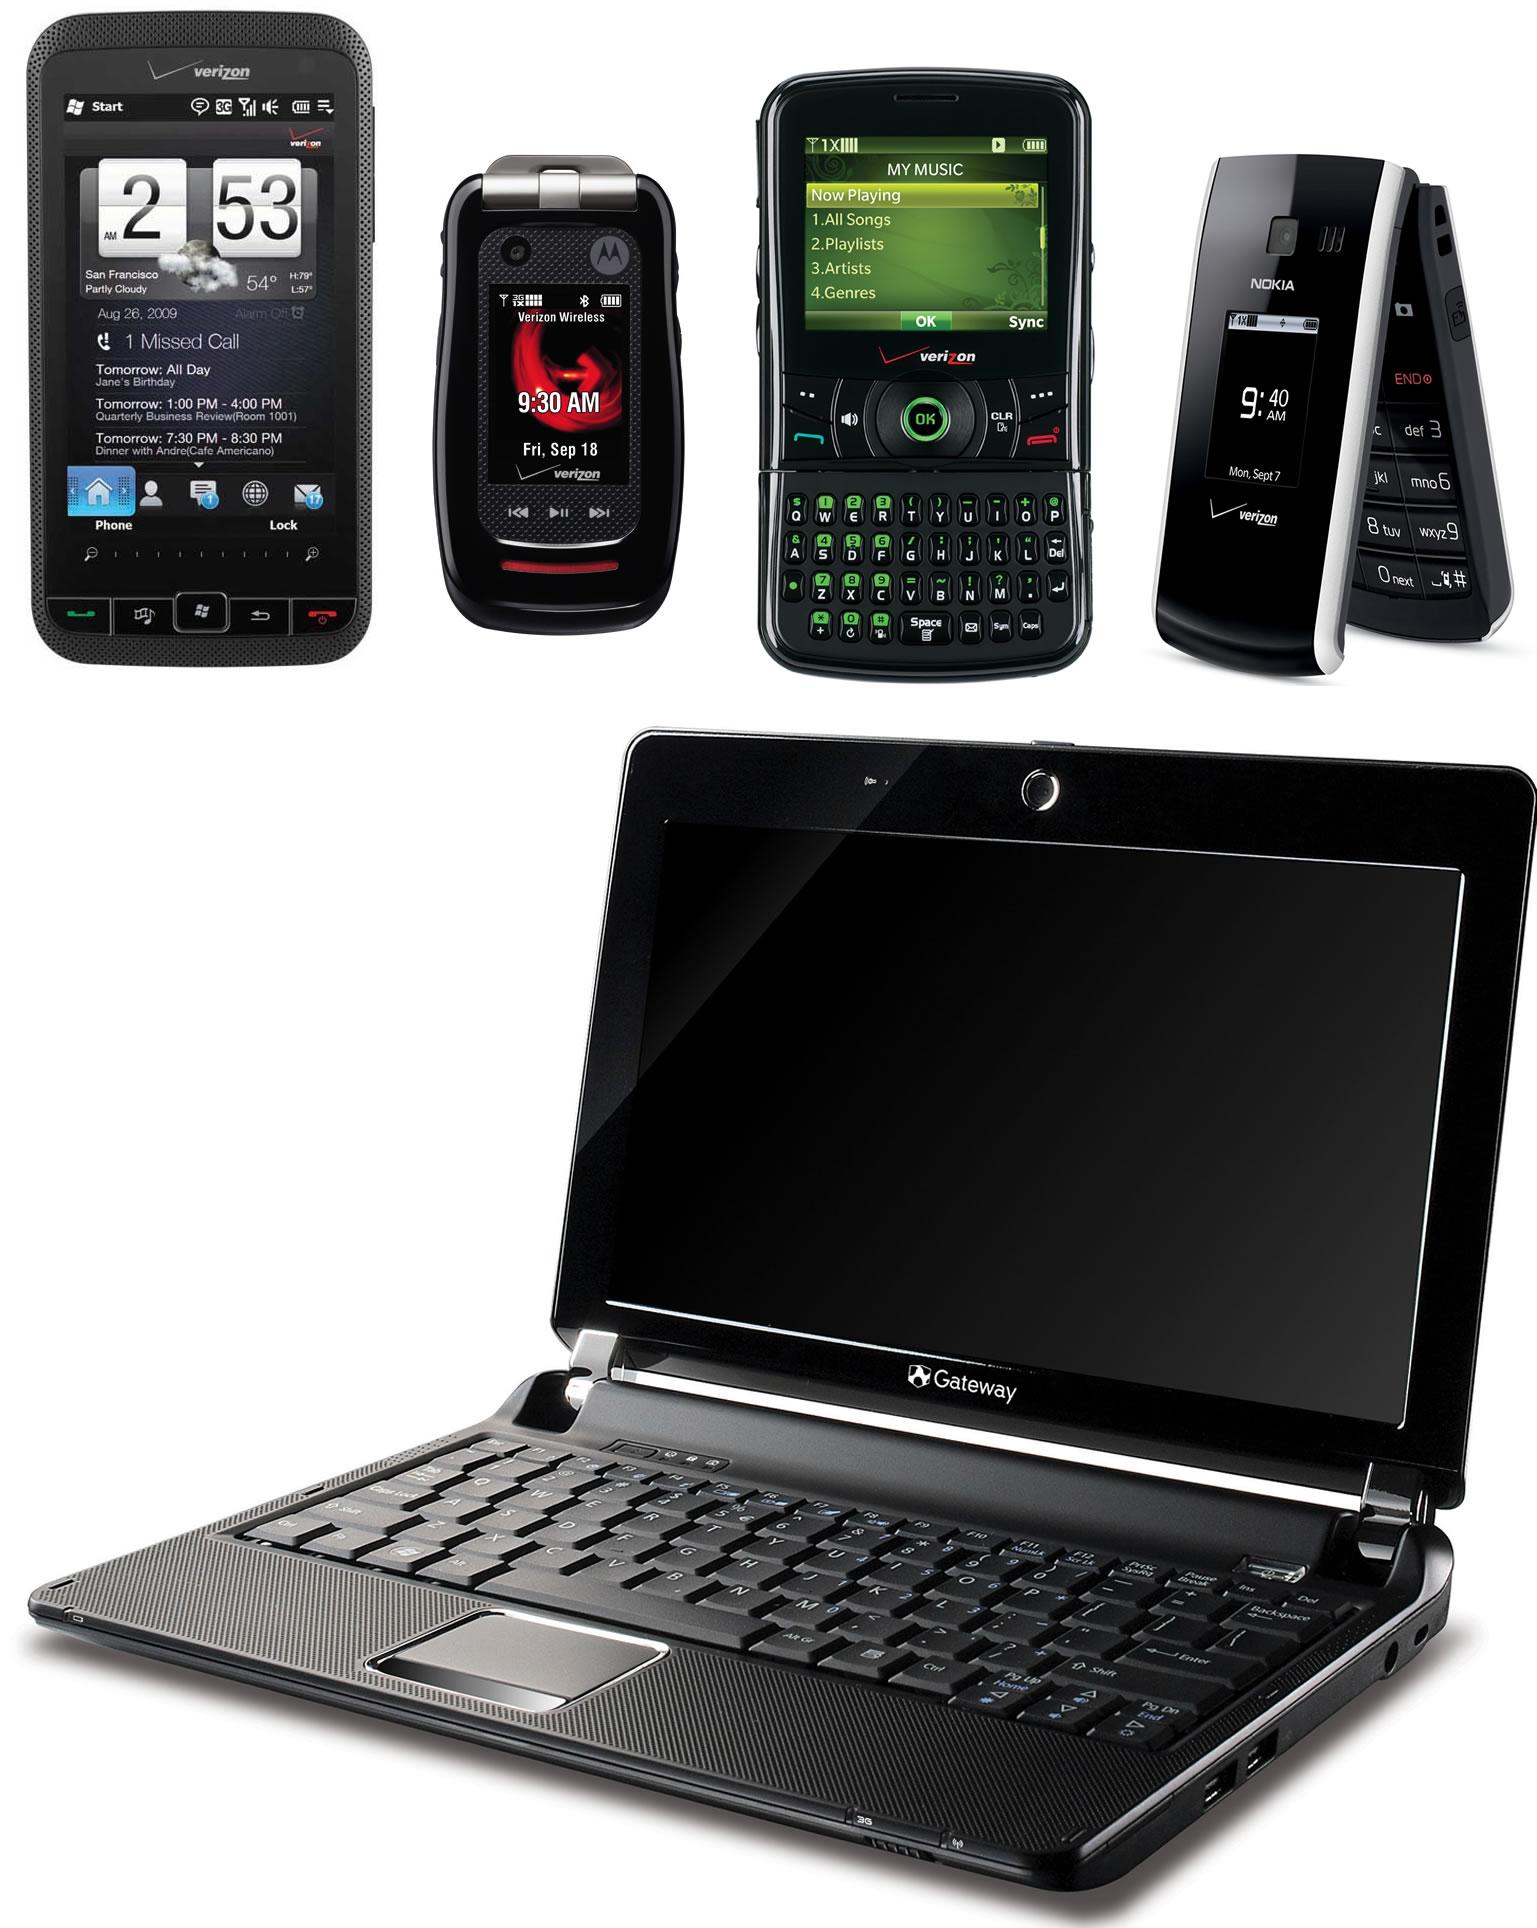 Verizon Announcement: Gateway LT20 netbook, Razzle, Motorola Barrage and Nokia 2705 Shade